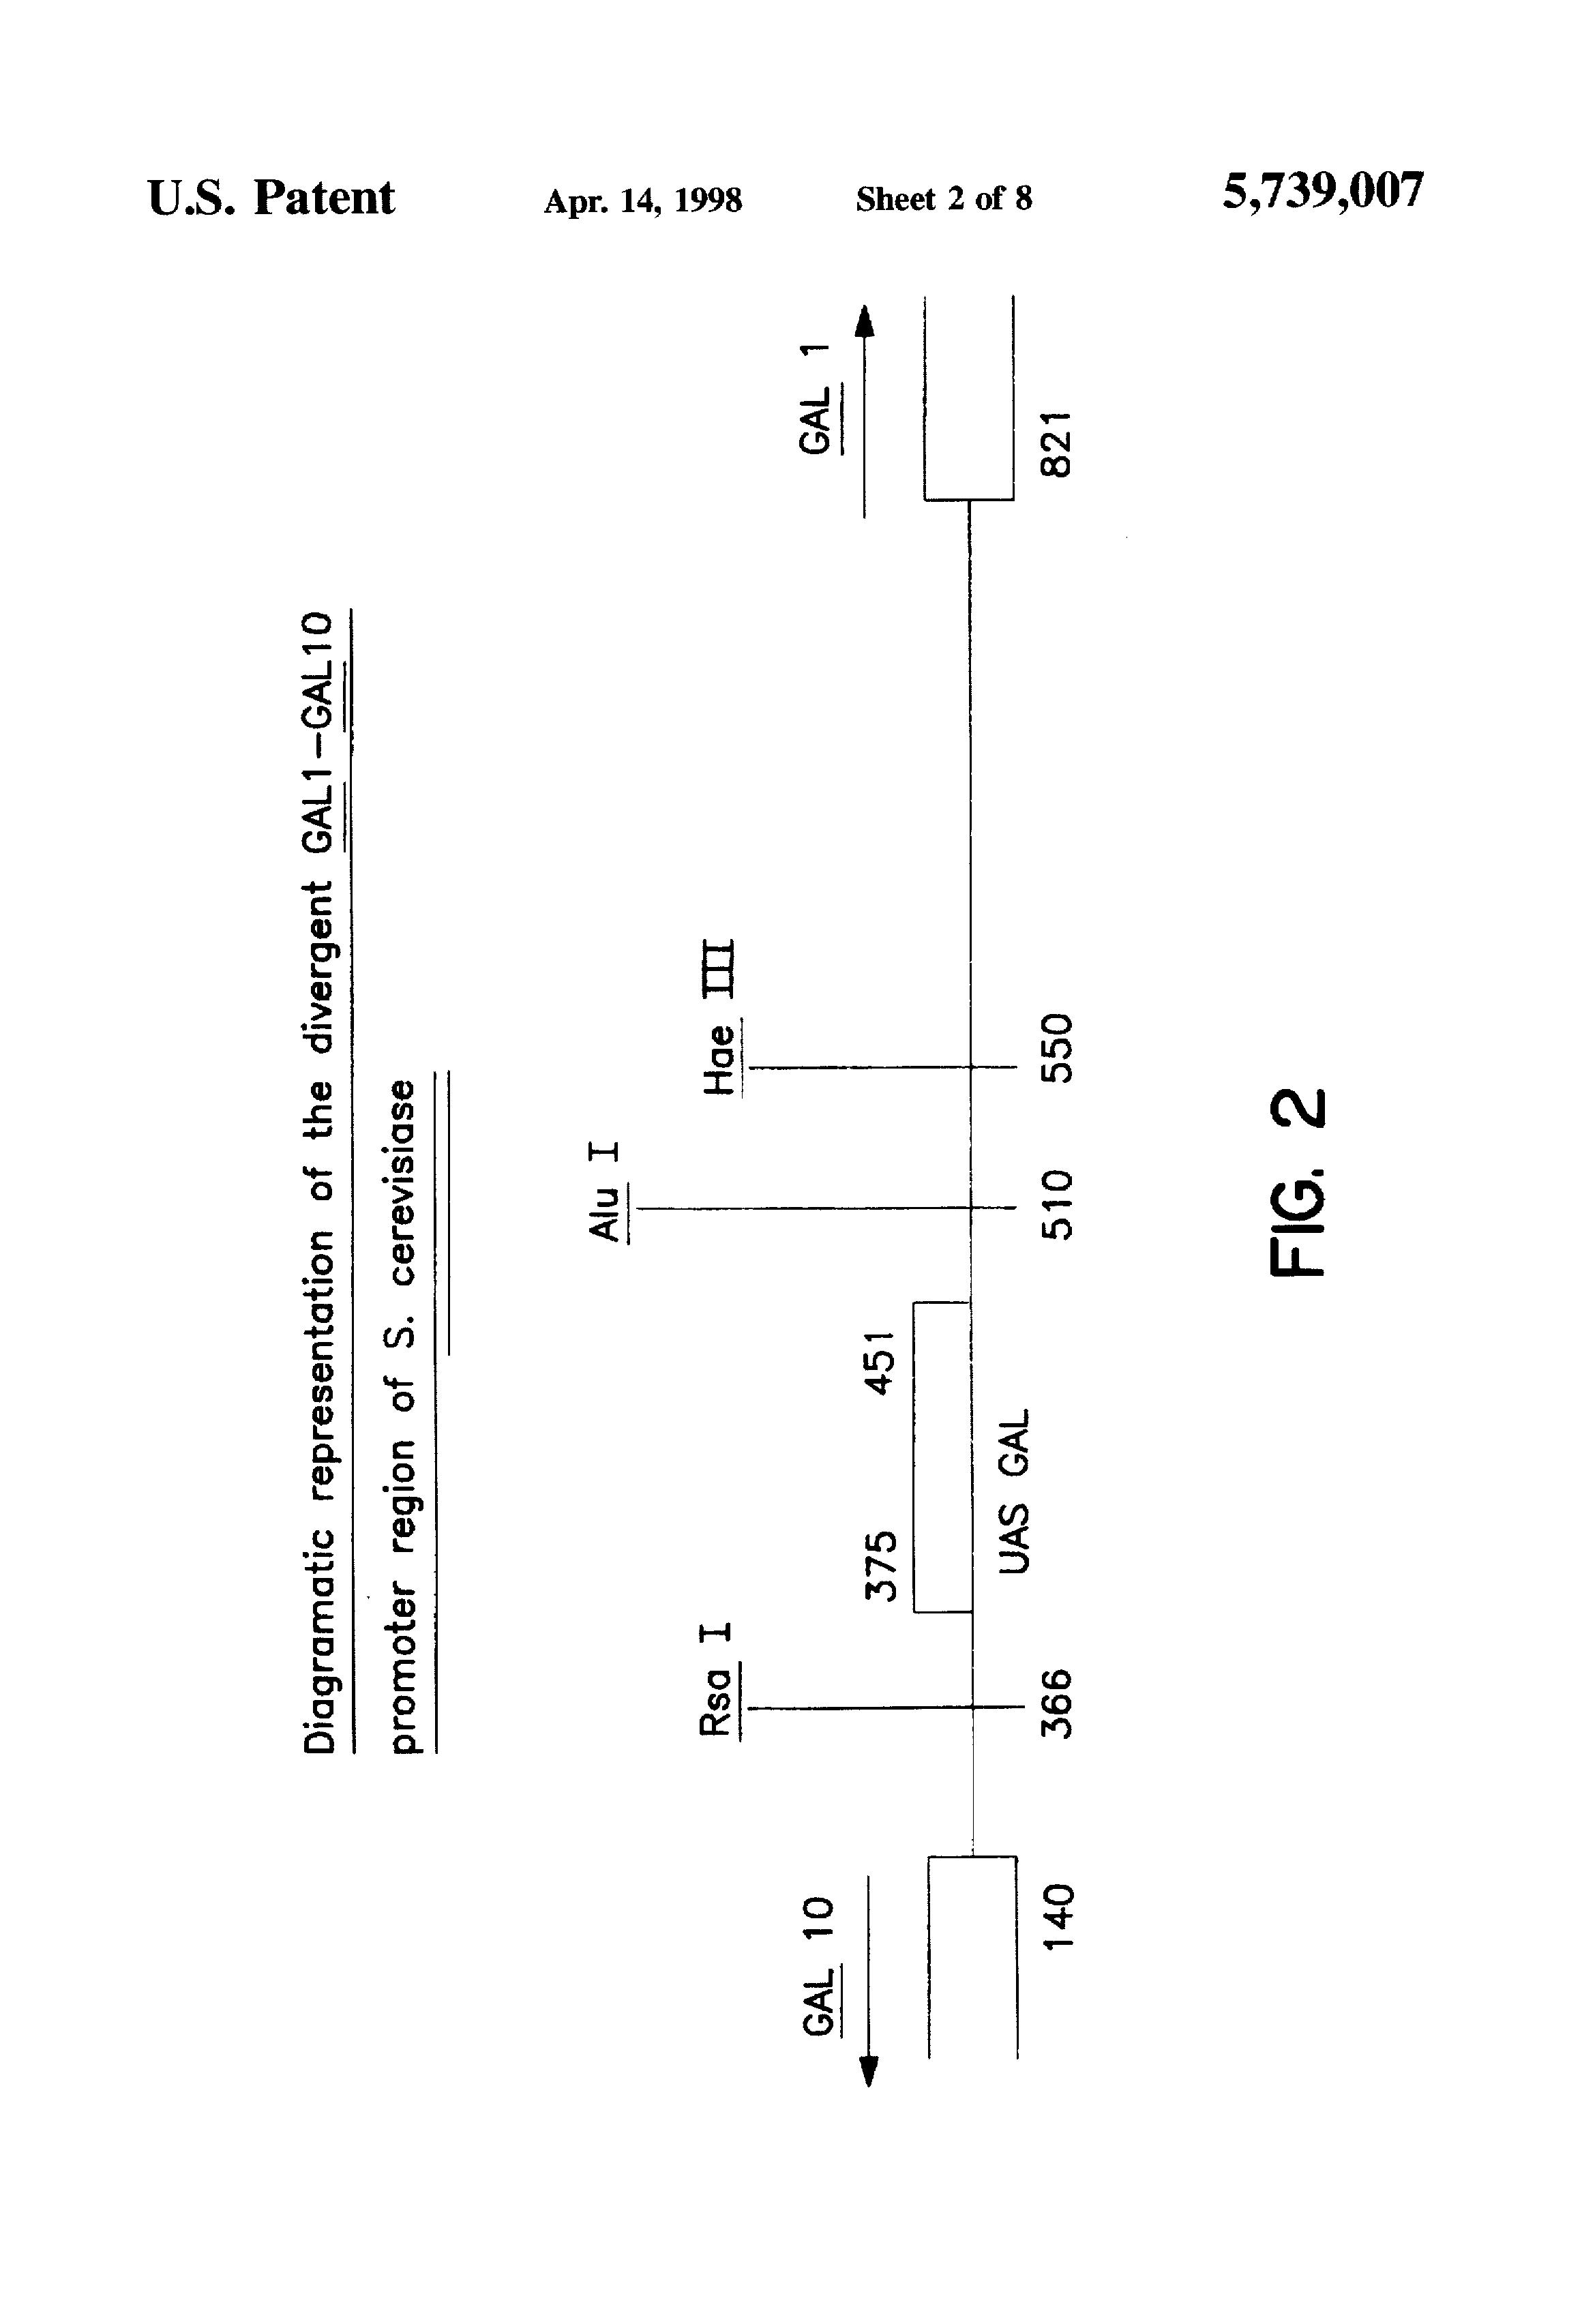 Patent Us5739007 Hybrid Gal10 Pgk Yeast Promoter Google Patents Buy 3 Get 1 Free Galten Drawing